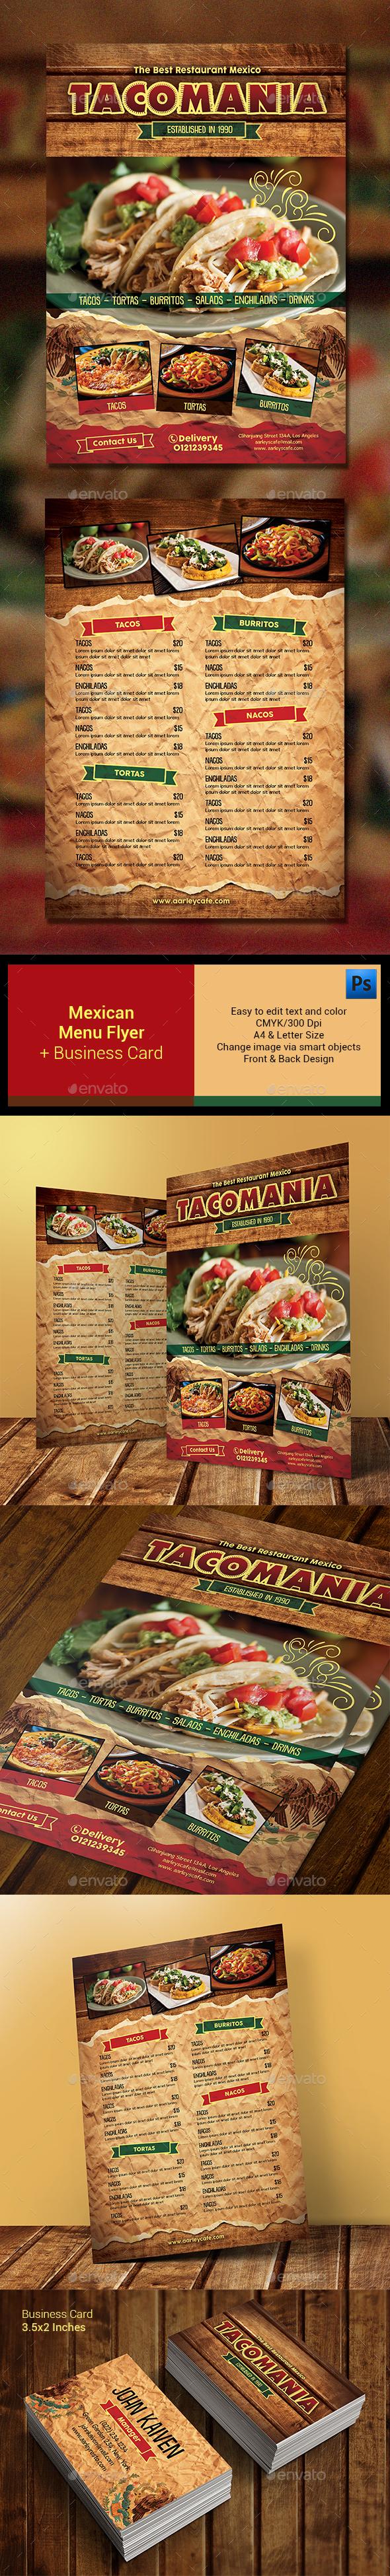 Mexican Menu + Business Card - Food Menus Print Templates